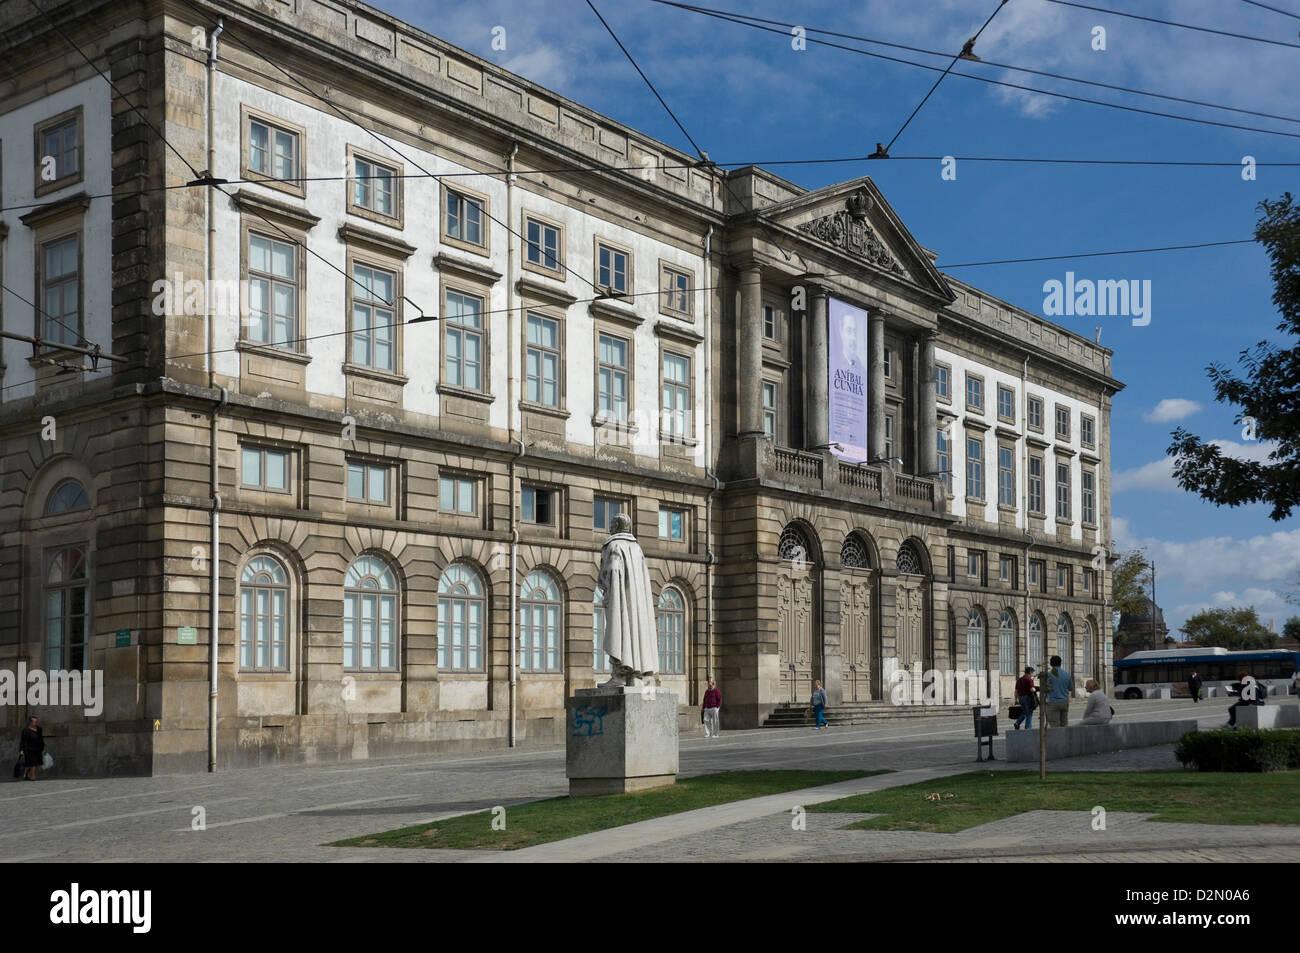 Natural History Museum, Oporto University, Oporto, Portugal, Europe - Stock Image